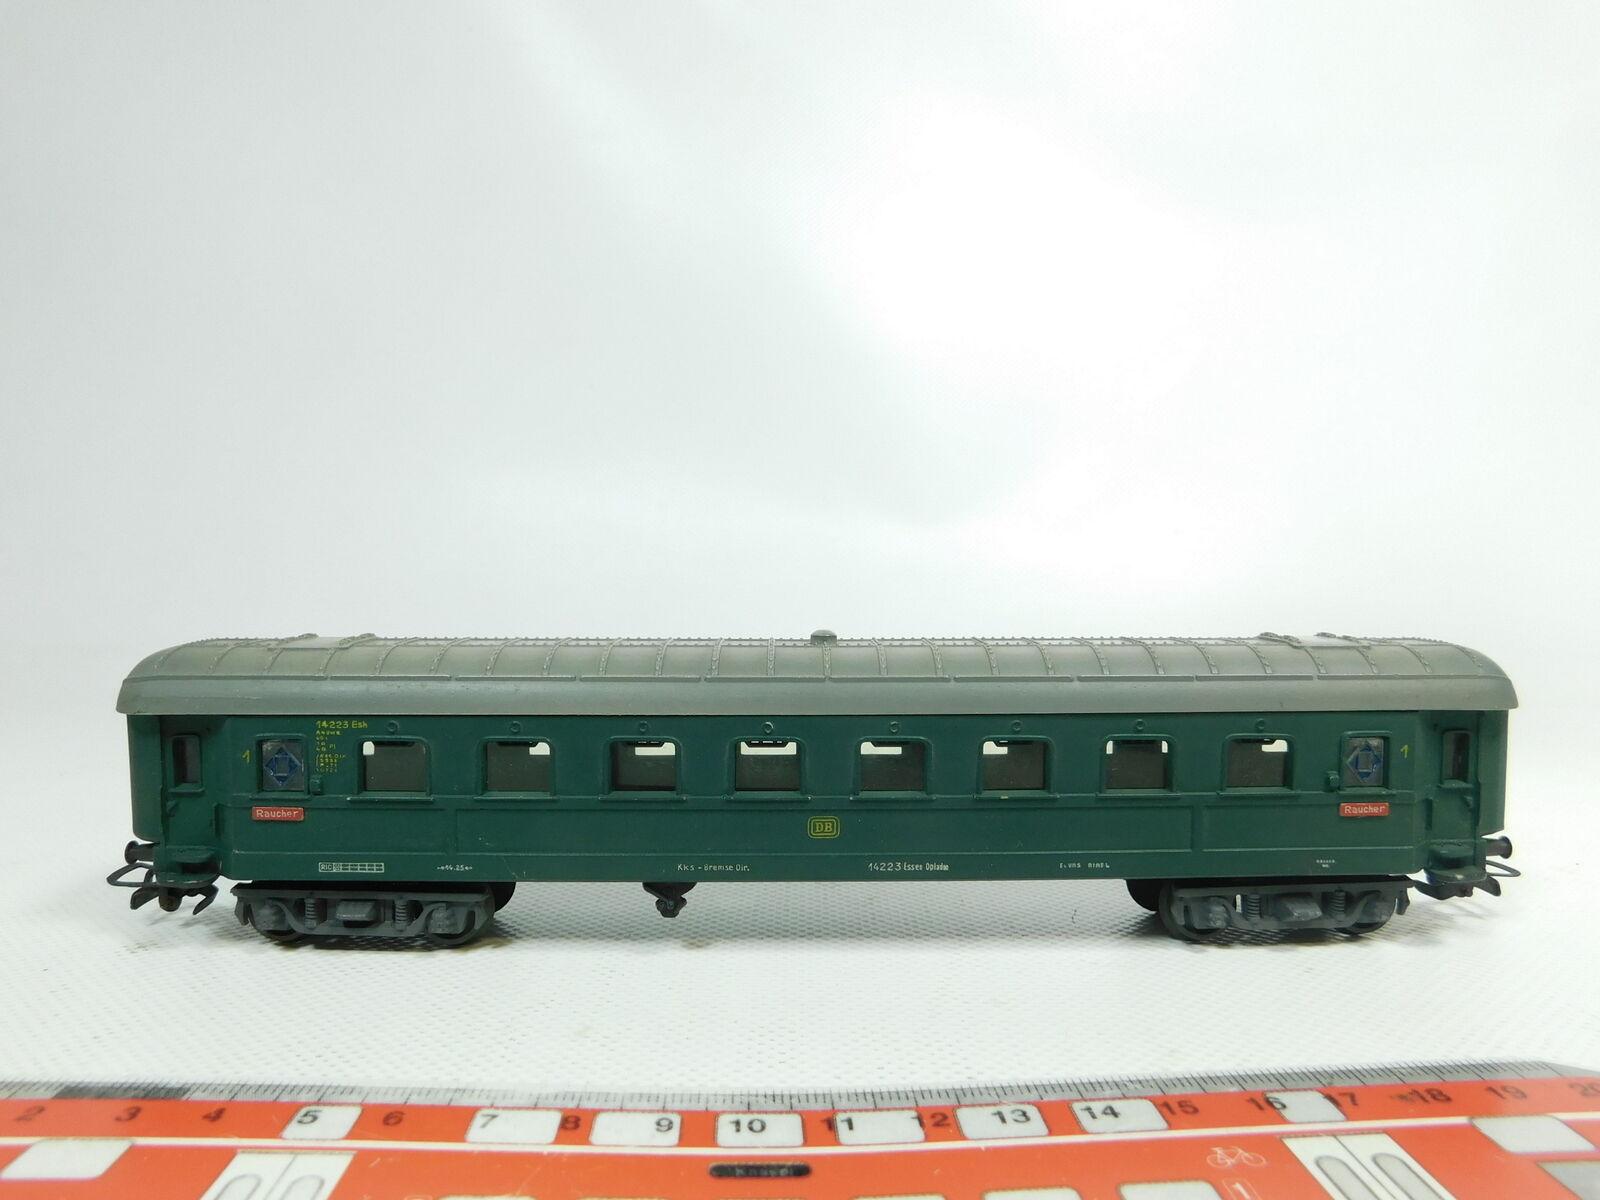 BJ177-0,5   Pocher H0 Dc 202 2 autoroza 1. classee Fumatori 14223 Esh DB